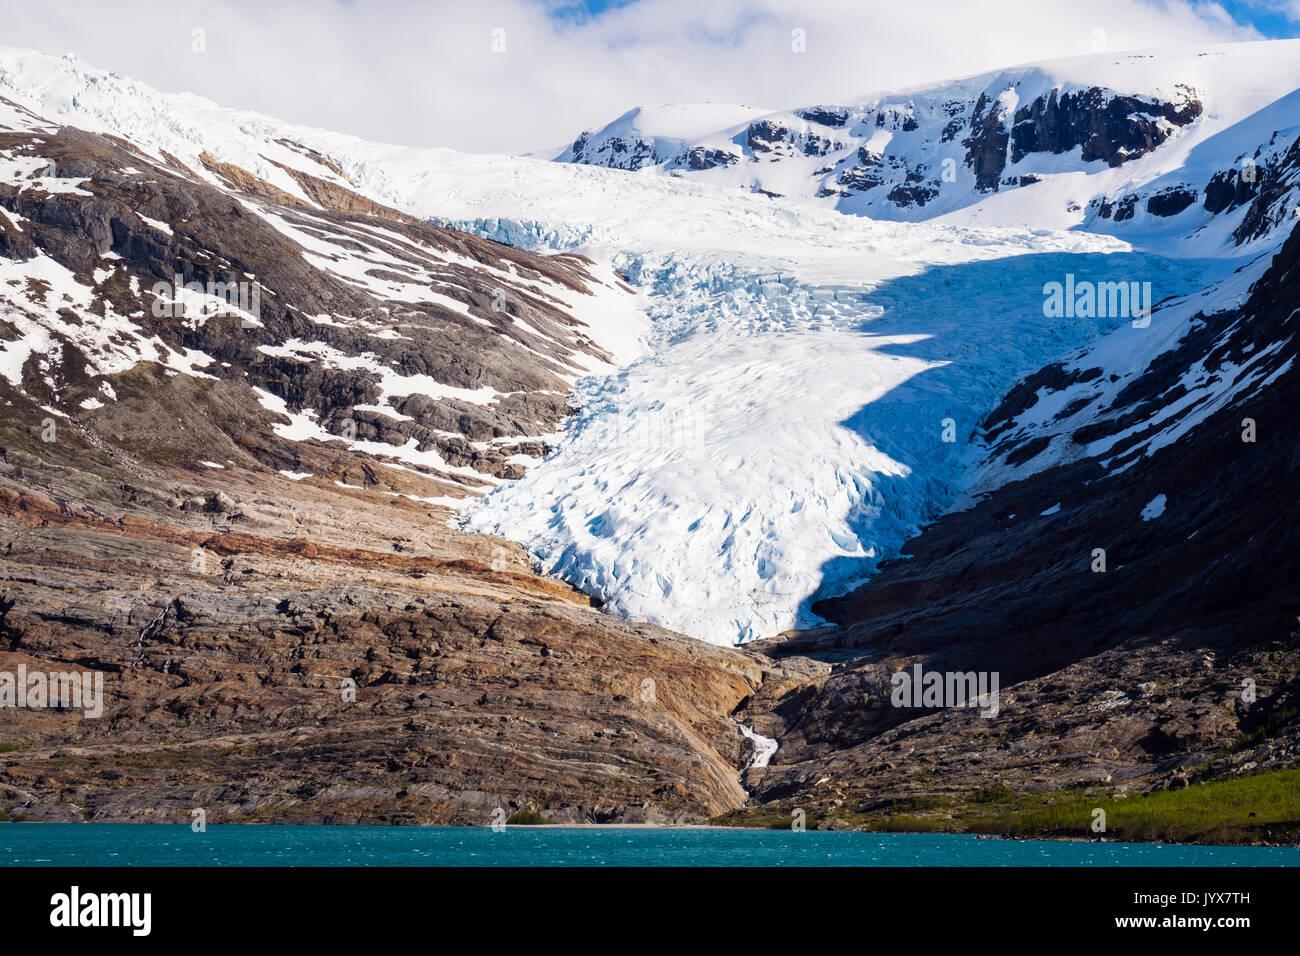 Engabreen oder Enga Gletscher Svartisen Arm der Eiskappe über Svartisvatnet oder Engabrevatnet See gesehen. Saltfjellet-Svartisen Nationalpark, Norwegen Stockbild